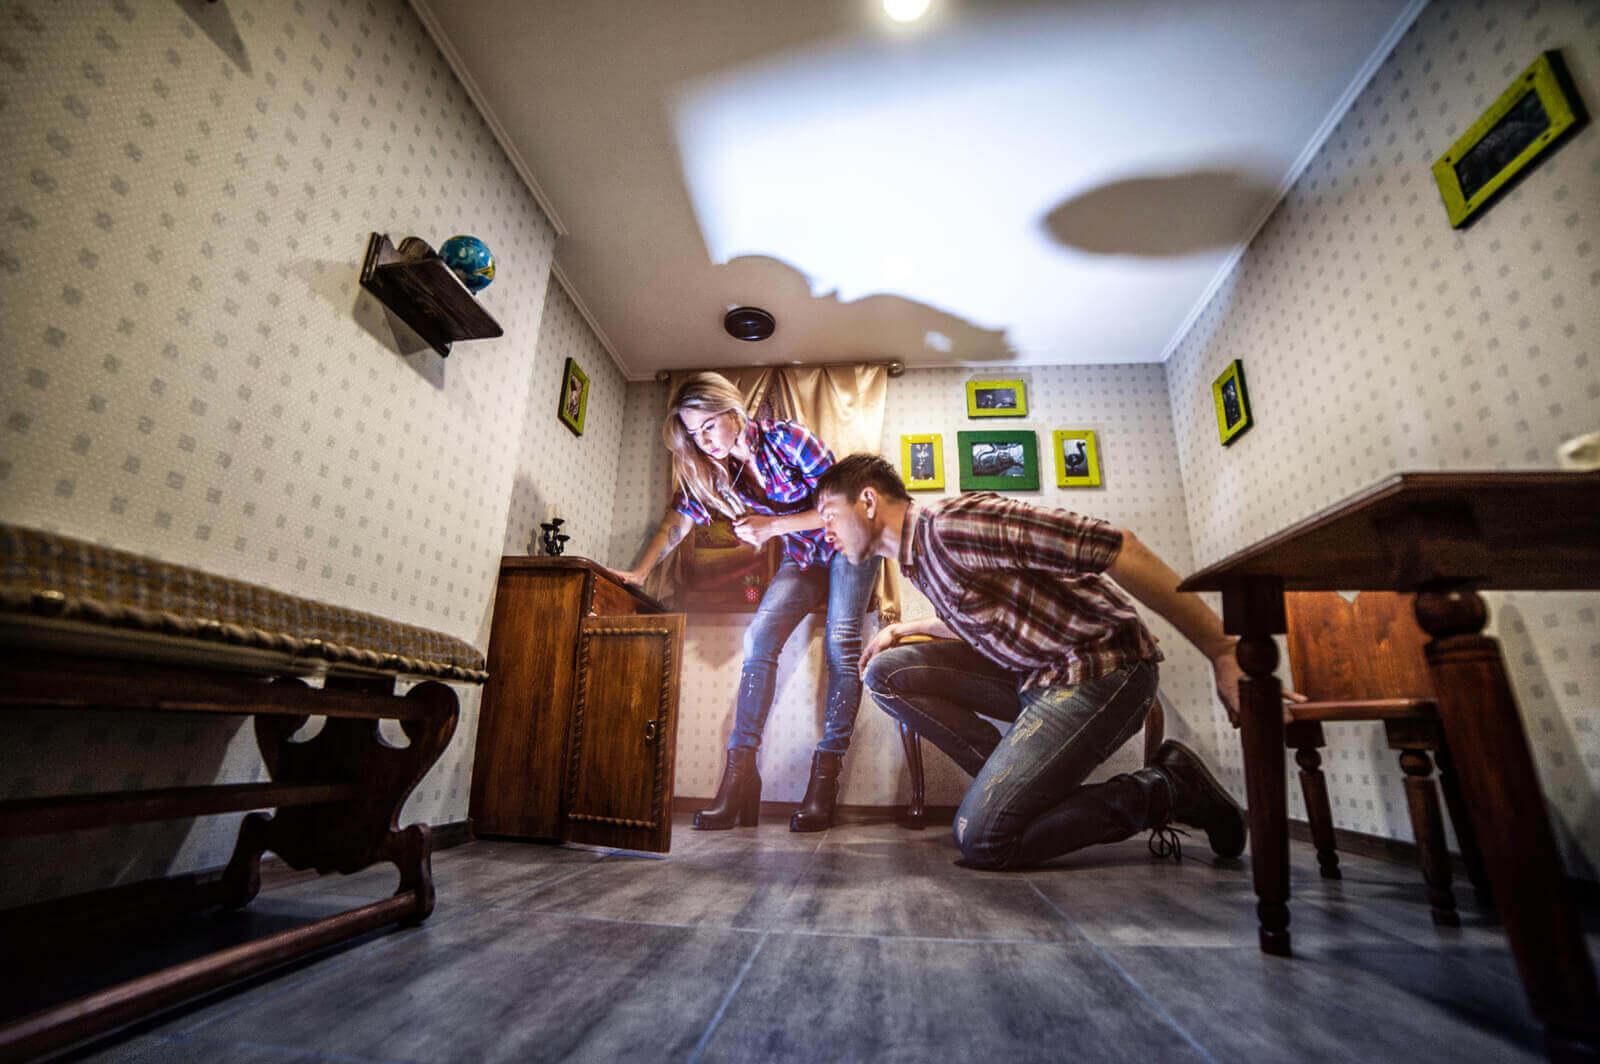 2 Фото квест комнаты Алиса в стране Чудес в городе Николаев